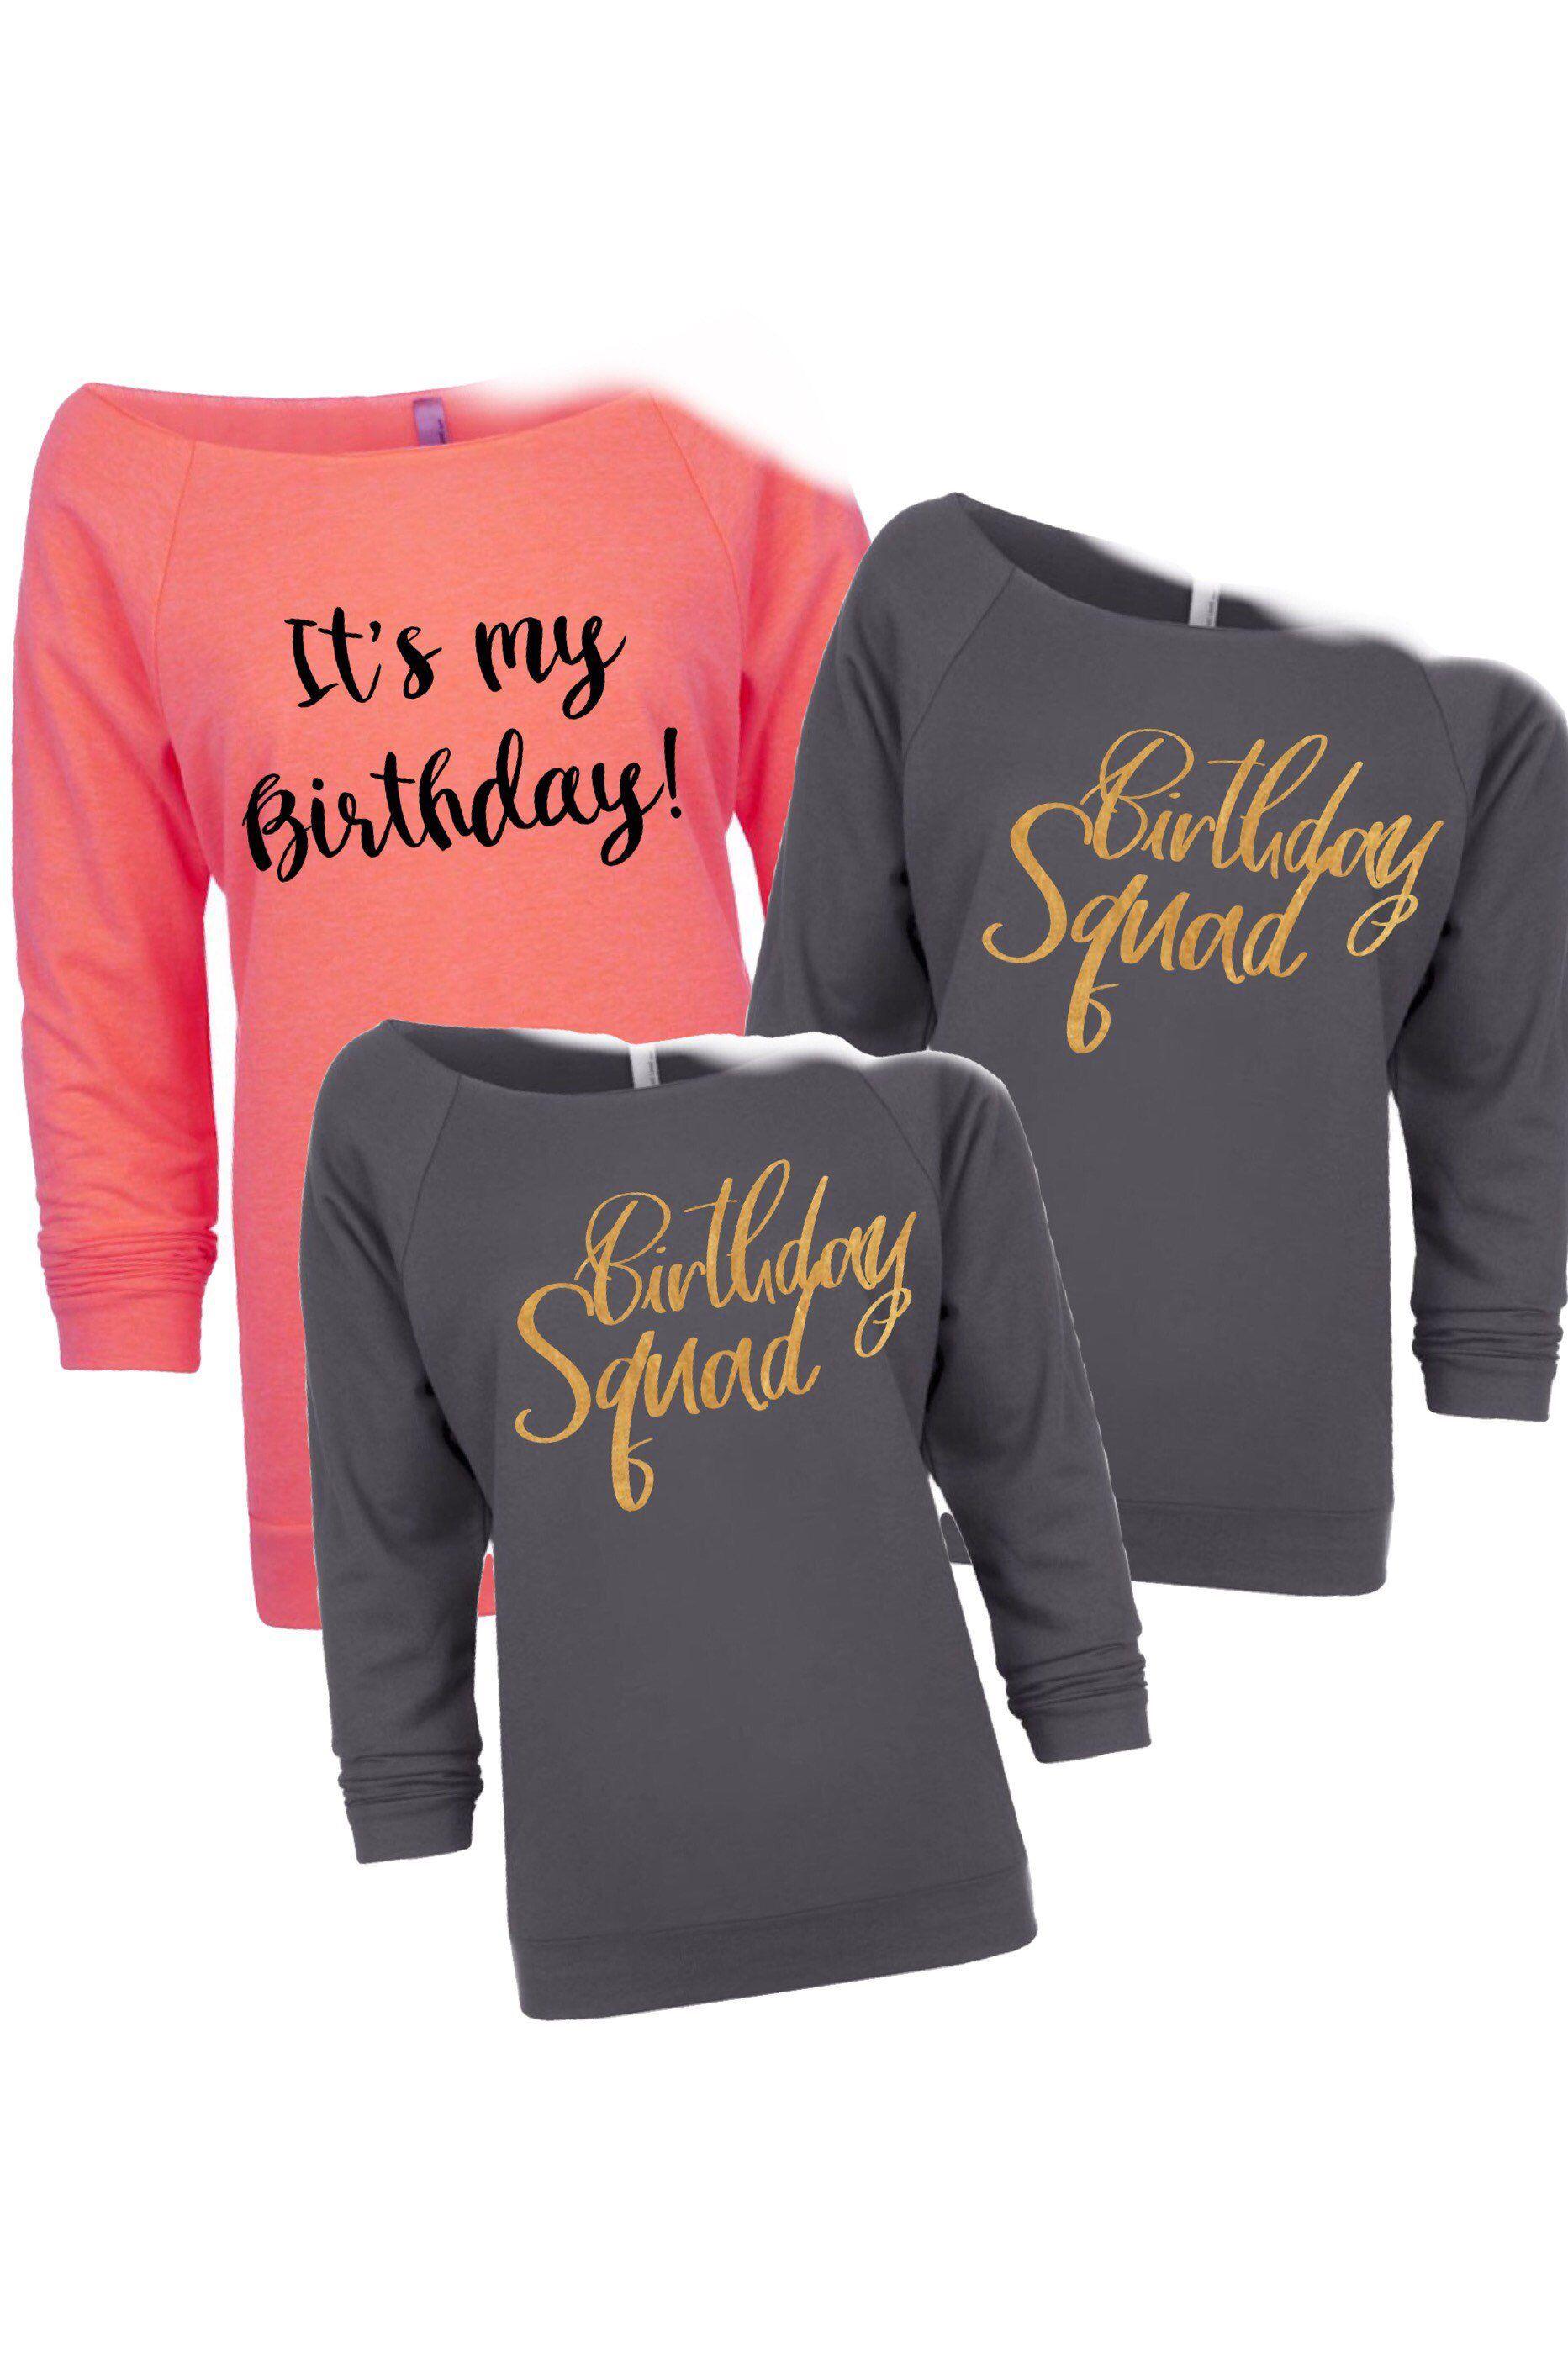 Birthday Shirt Squad Shirts Party Trip Girl